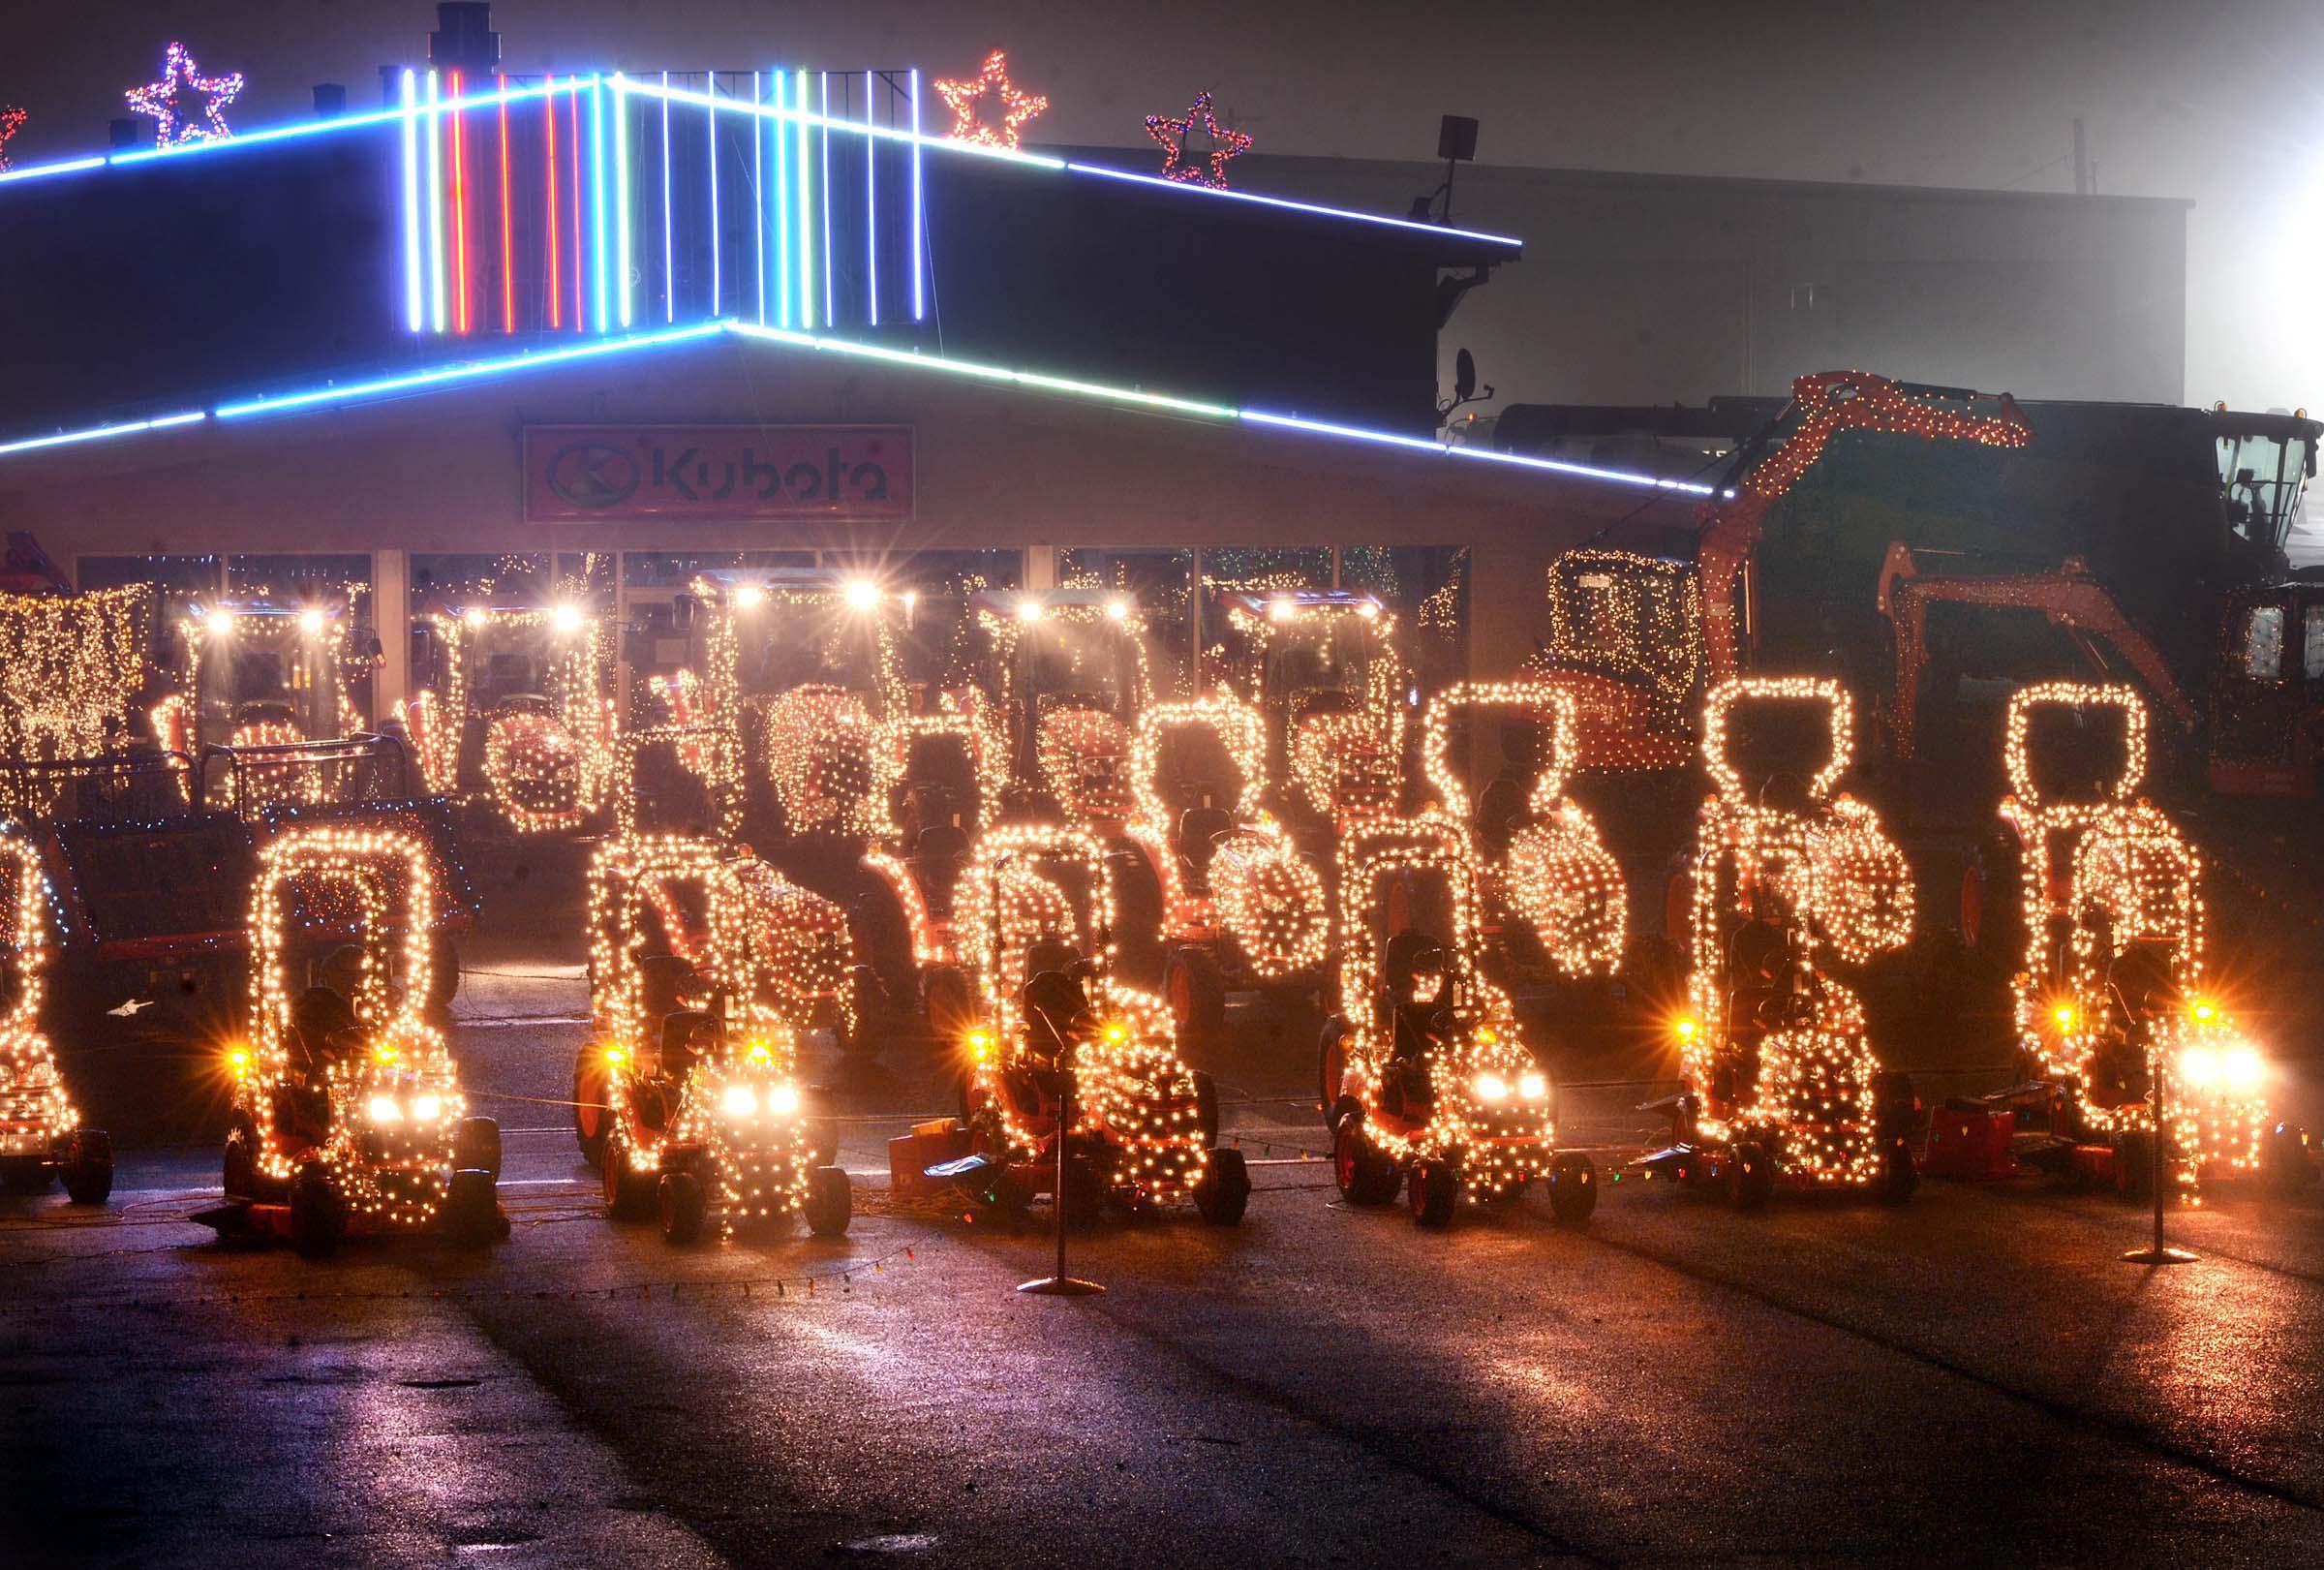 Messick Christmas Lights 2021 Messick S Christmas Light Show In Elizabethtown Opens Friday Raises Money For Charities Entertainment Lancasteronline Com